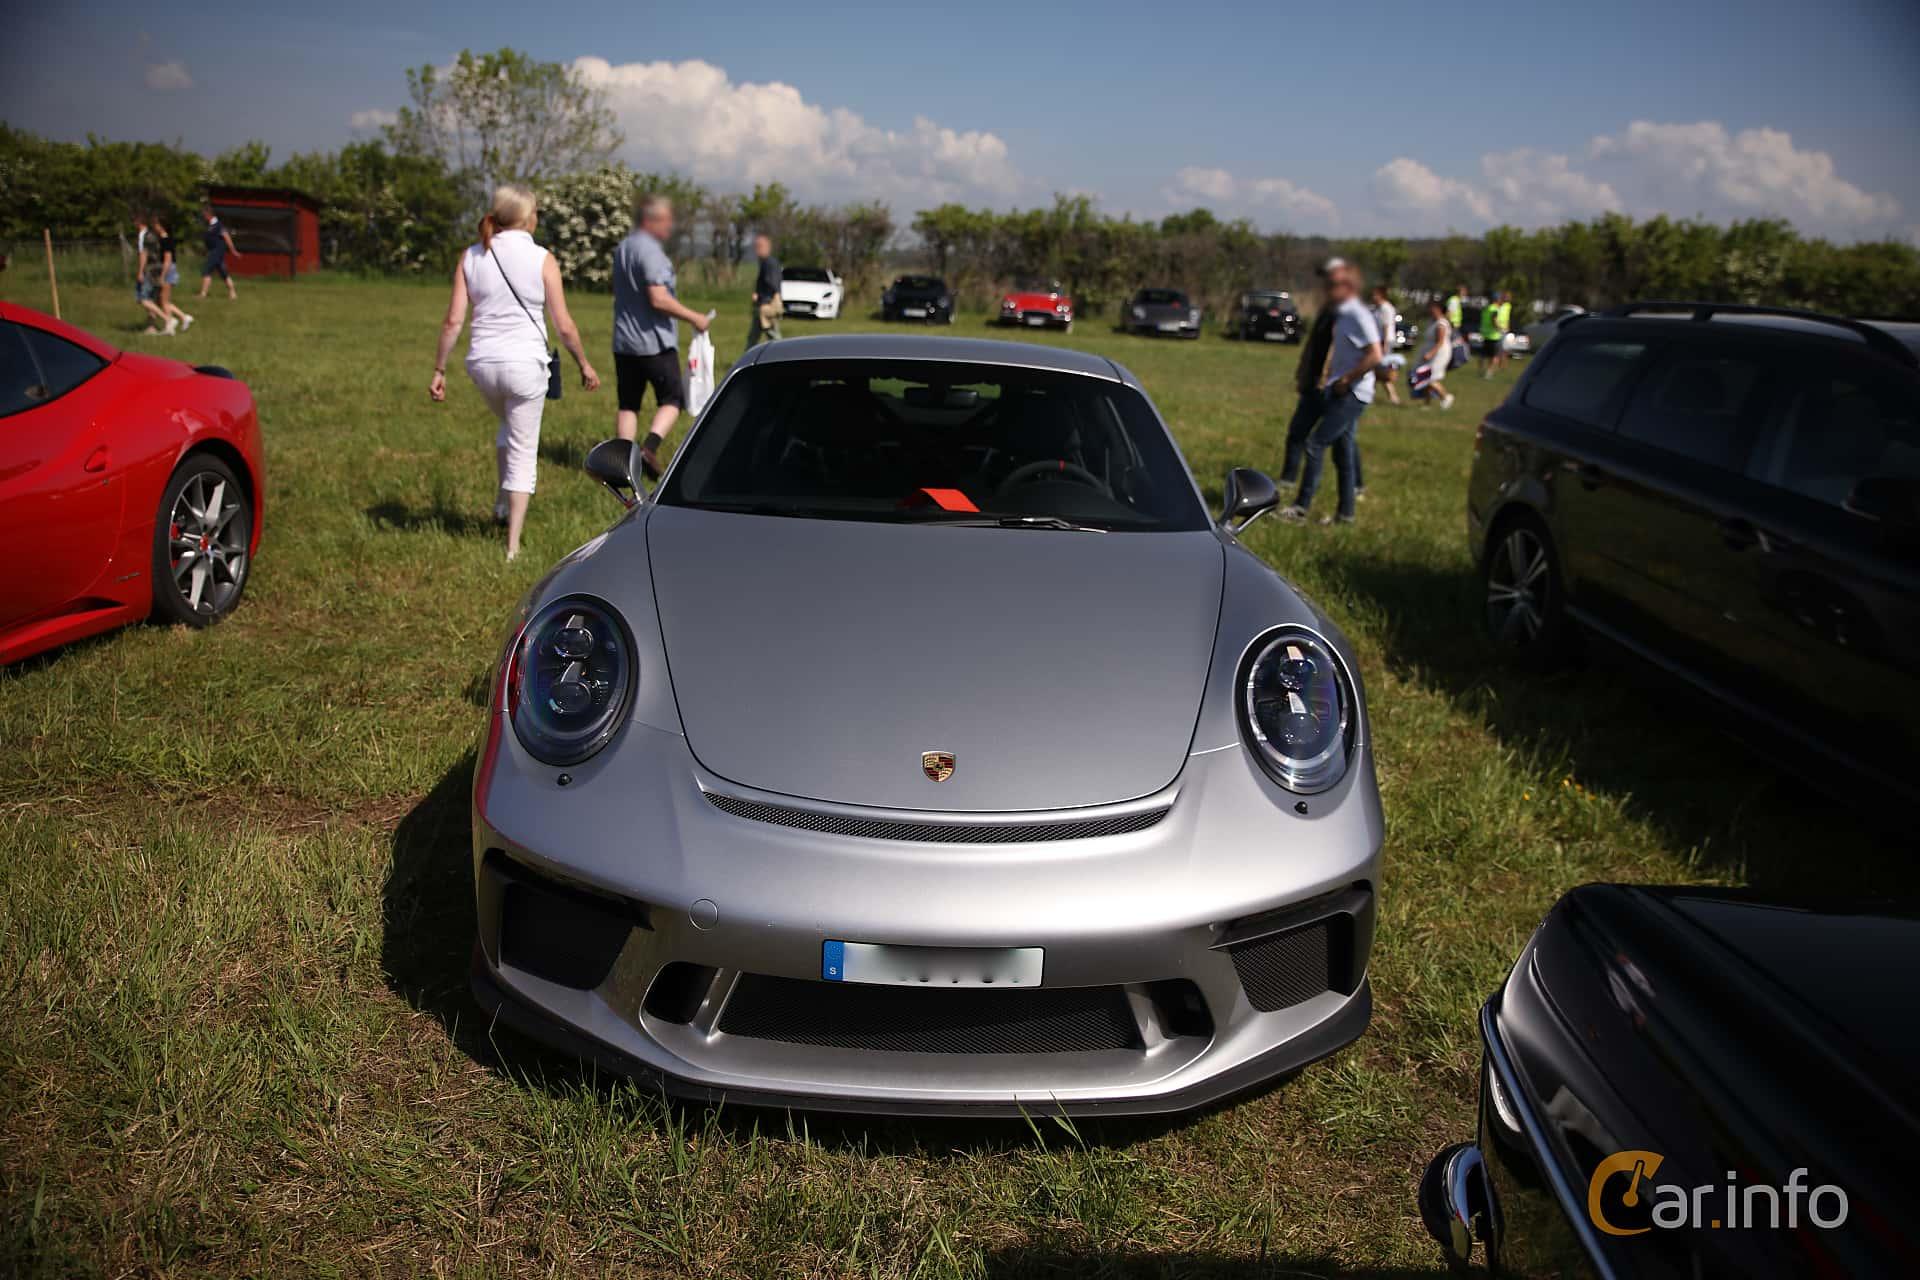 Porsche 911 GT3 4.0 H6 Manual, 500hp, 2018 at Tjolöholm Classic Motor 2018